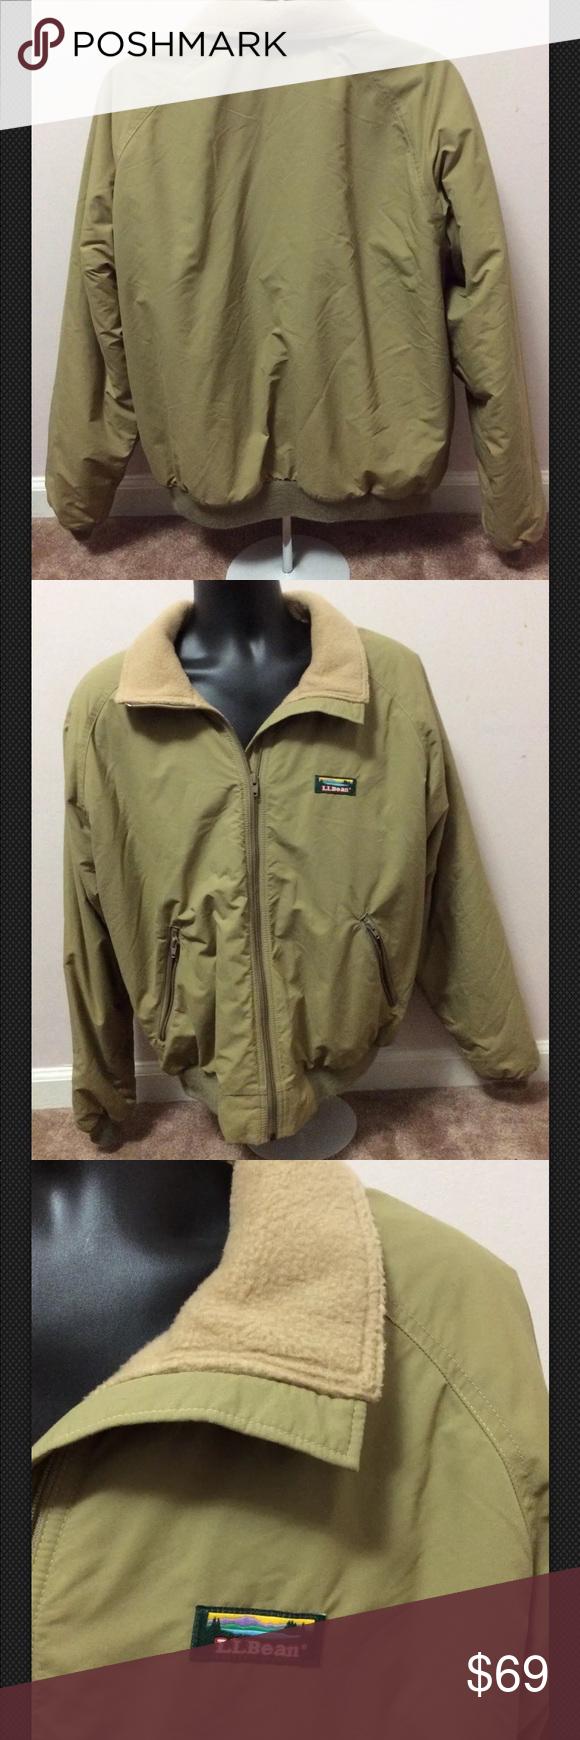 S s ll bean warm up jacket coat ski fleece usa classic coat in a